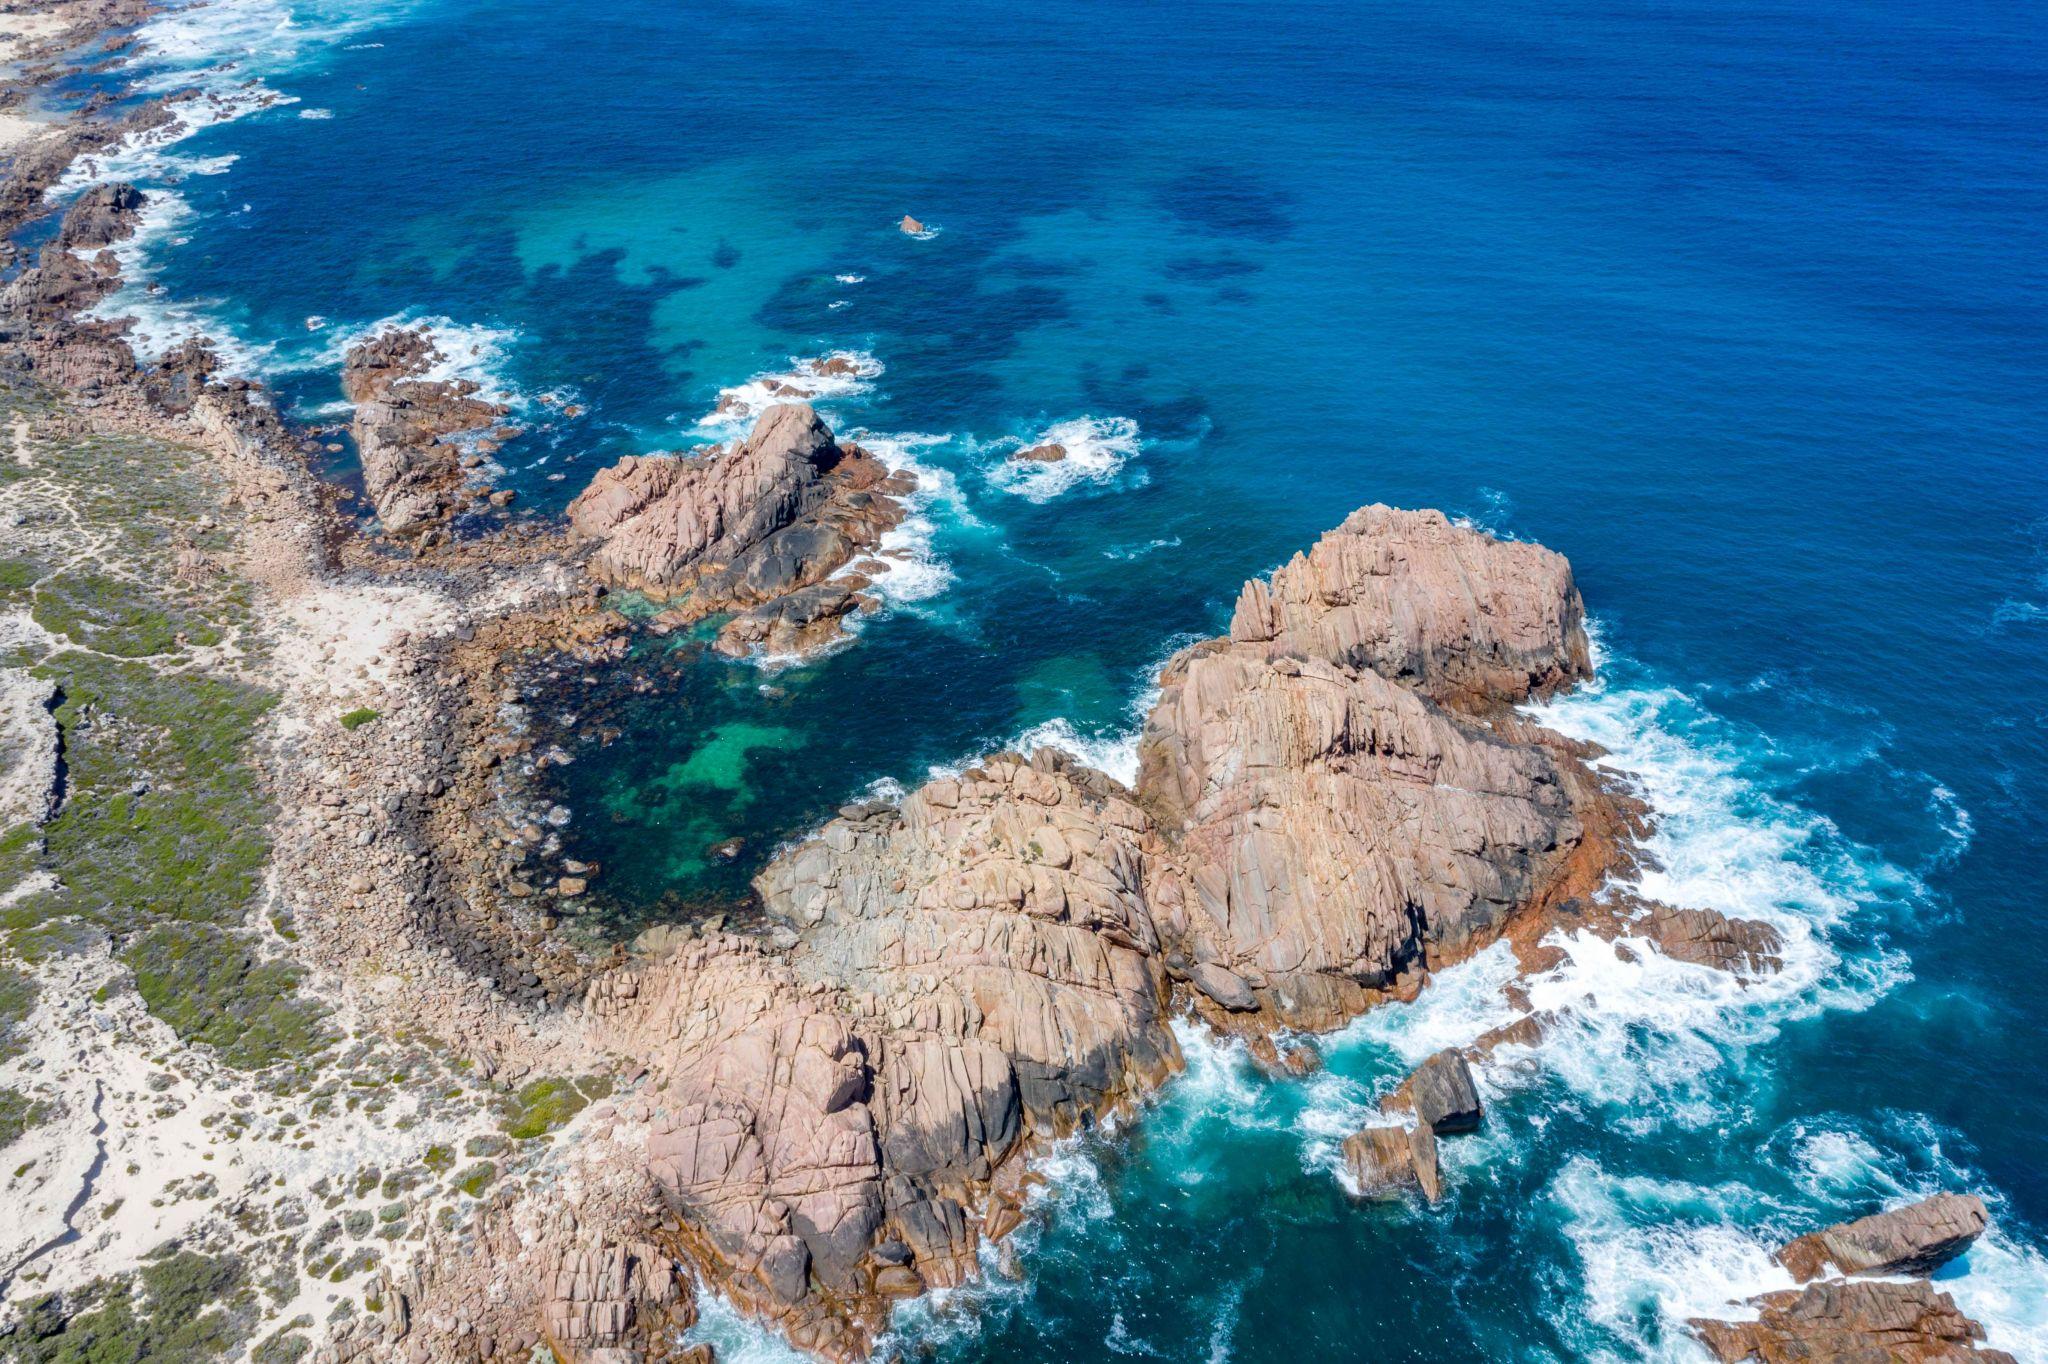 Sugar Loaf Rock, Naturaliste, Western Australia, Australia